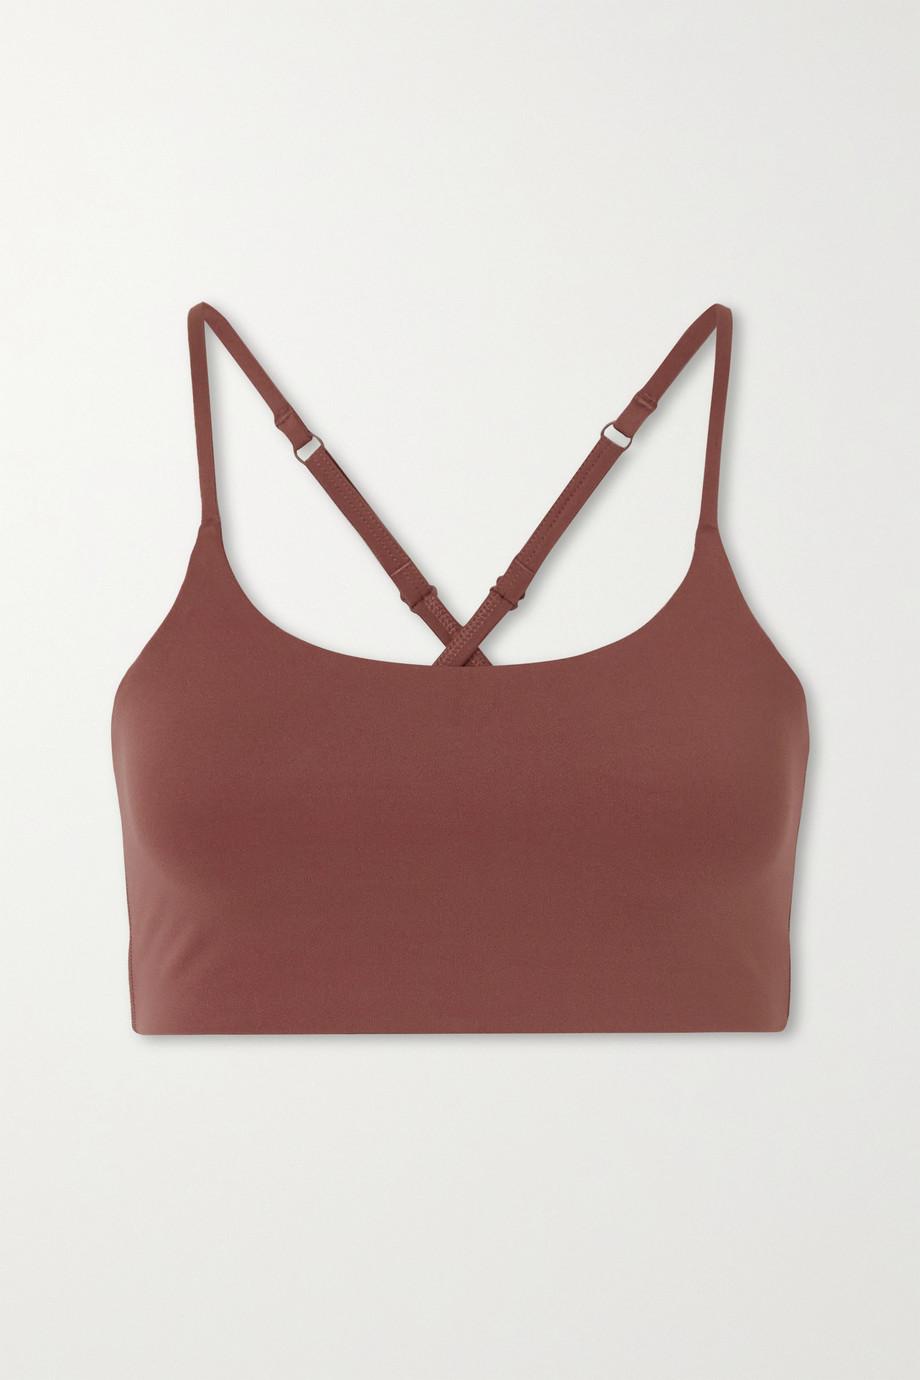 Girlfriend Collective + NET SUSTAIN Juliet recycled stretch sports bra